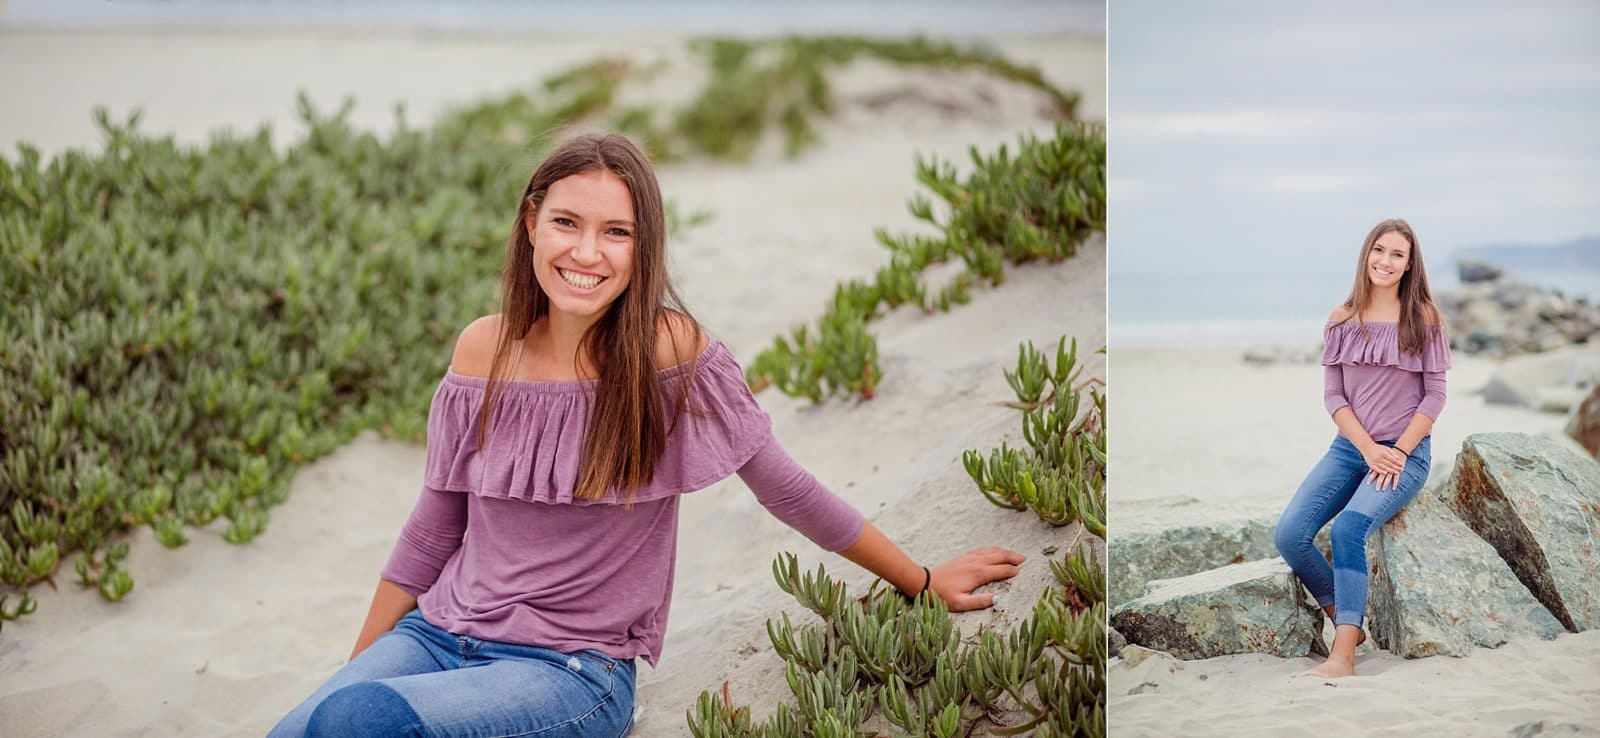 San Diego Photographers   Amy Gray Photography